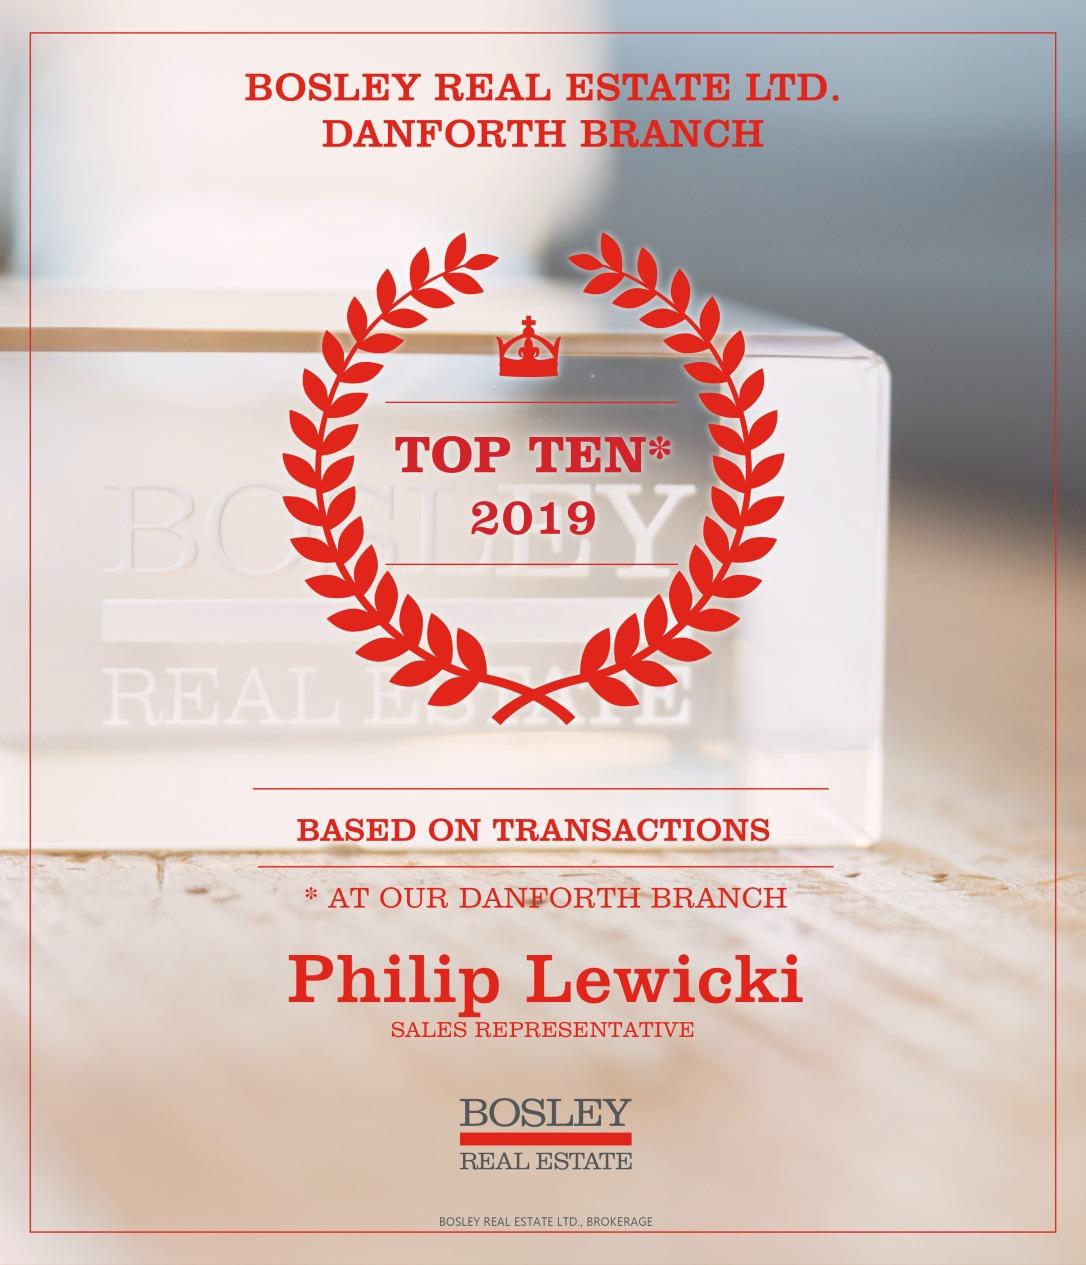 Top 10 Danforth Agents 20198.jpg